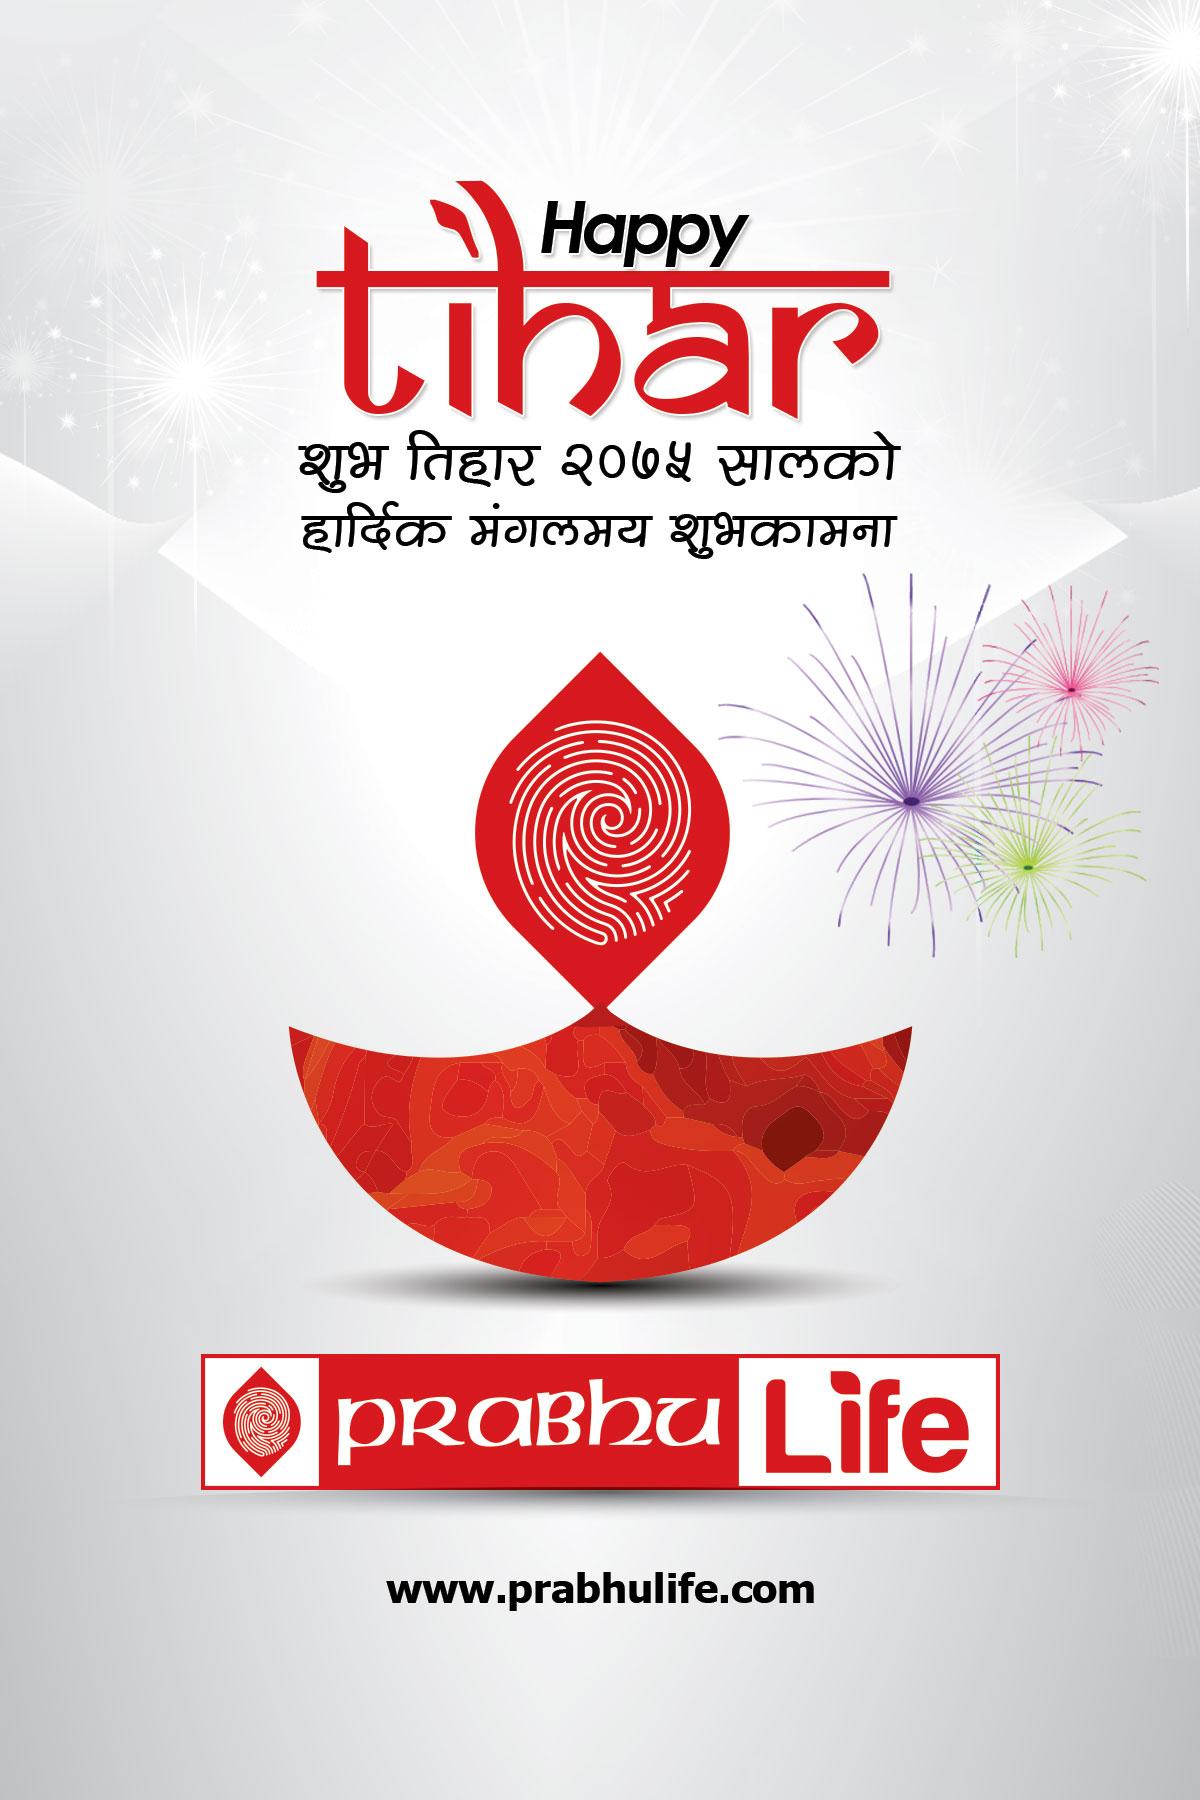 Prabhu Life Insurance Tihar Greeting 2075